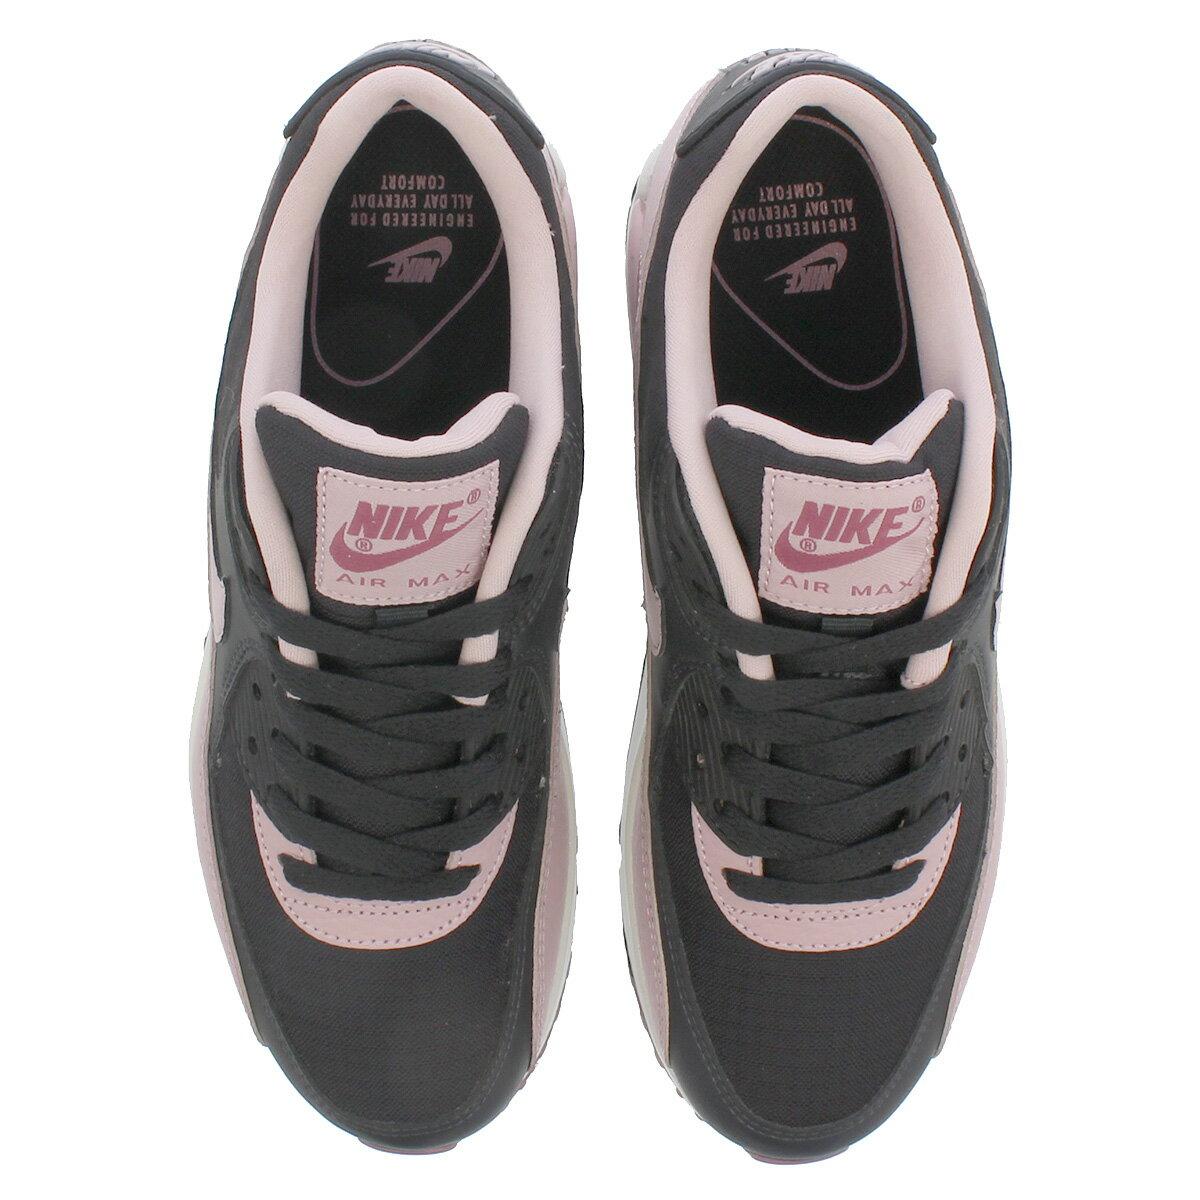 Nike Women Air Max 90 (GreyPlum) READY TO SEND SALE